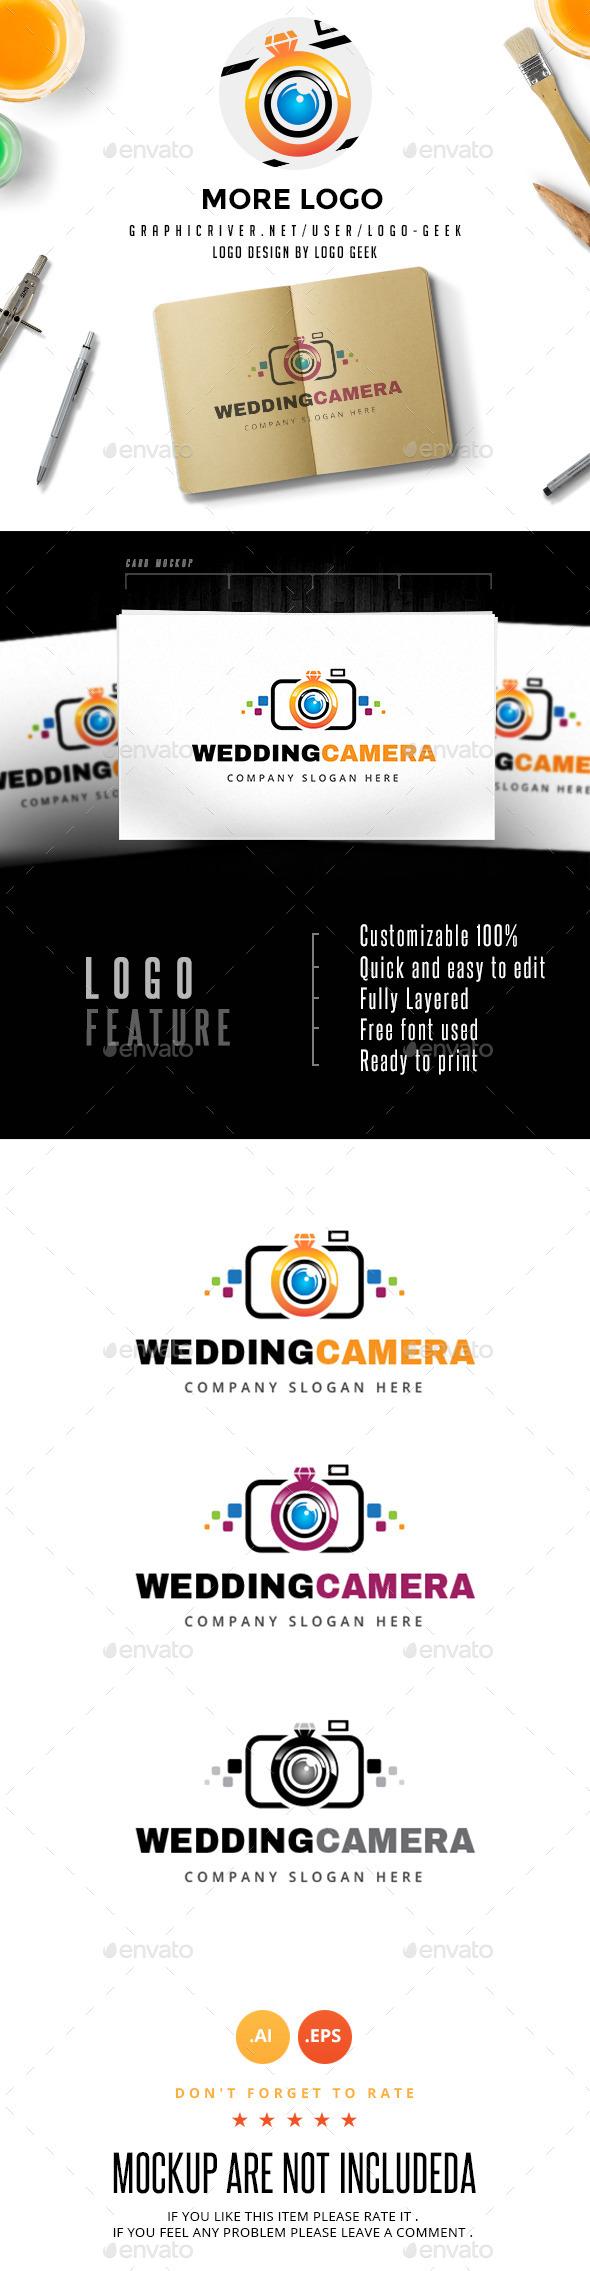 Wedding Camera Logo - Objects Logo Templates